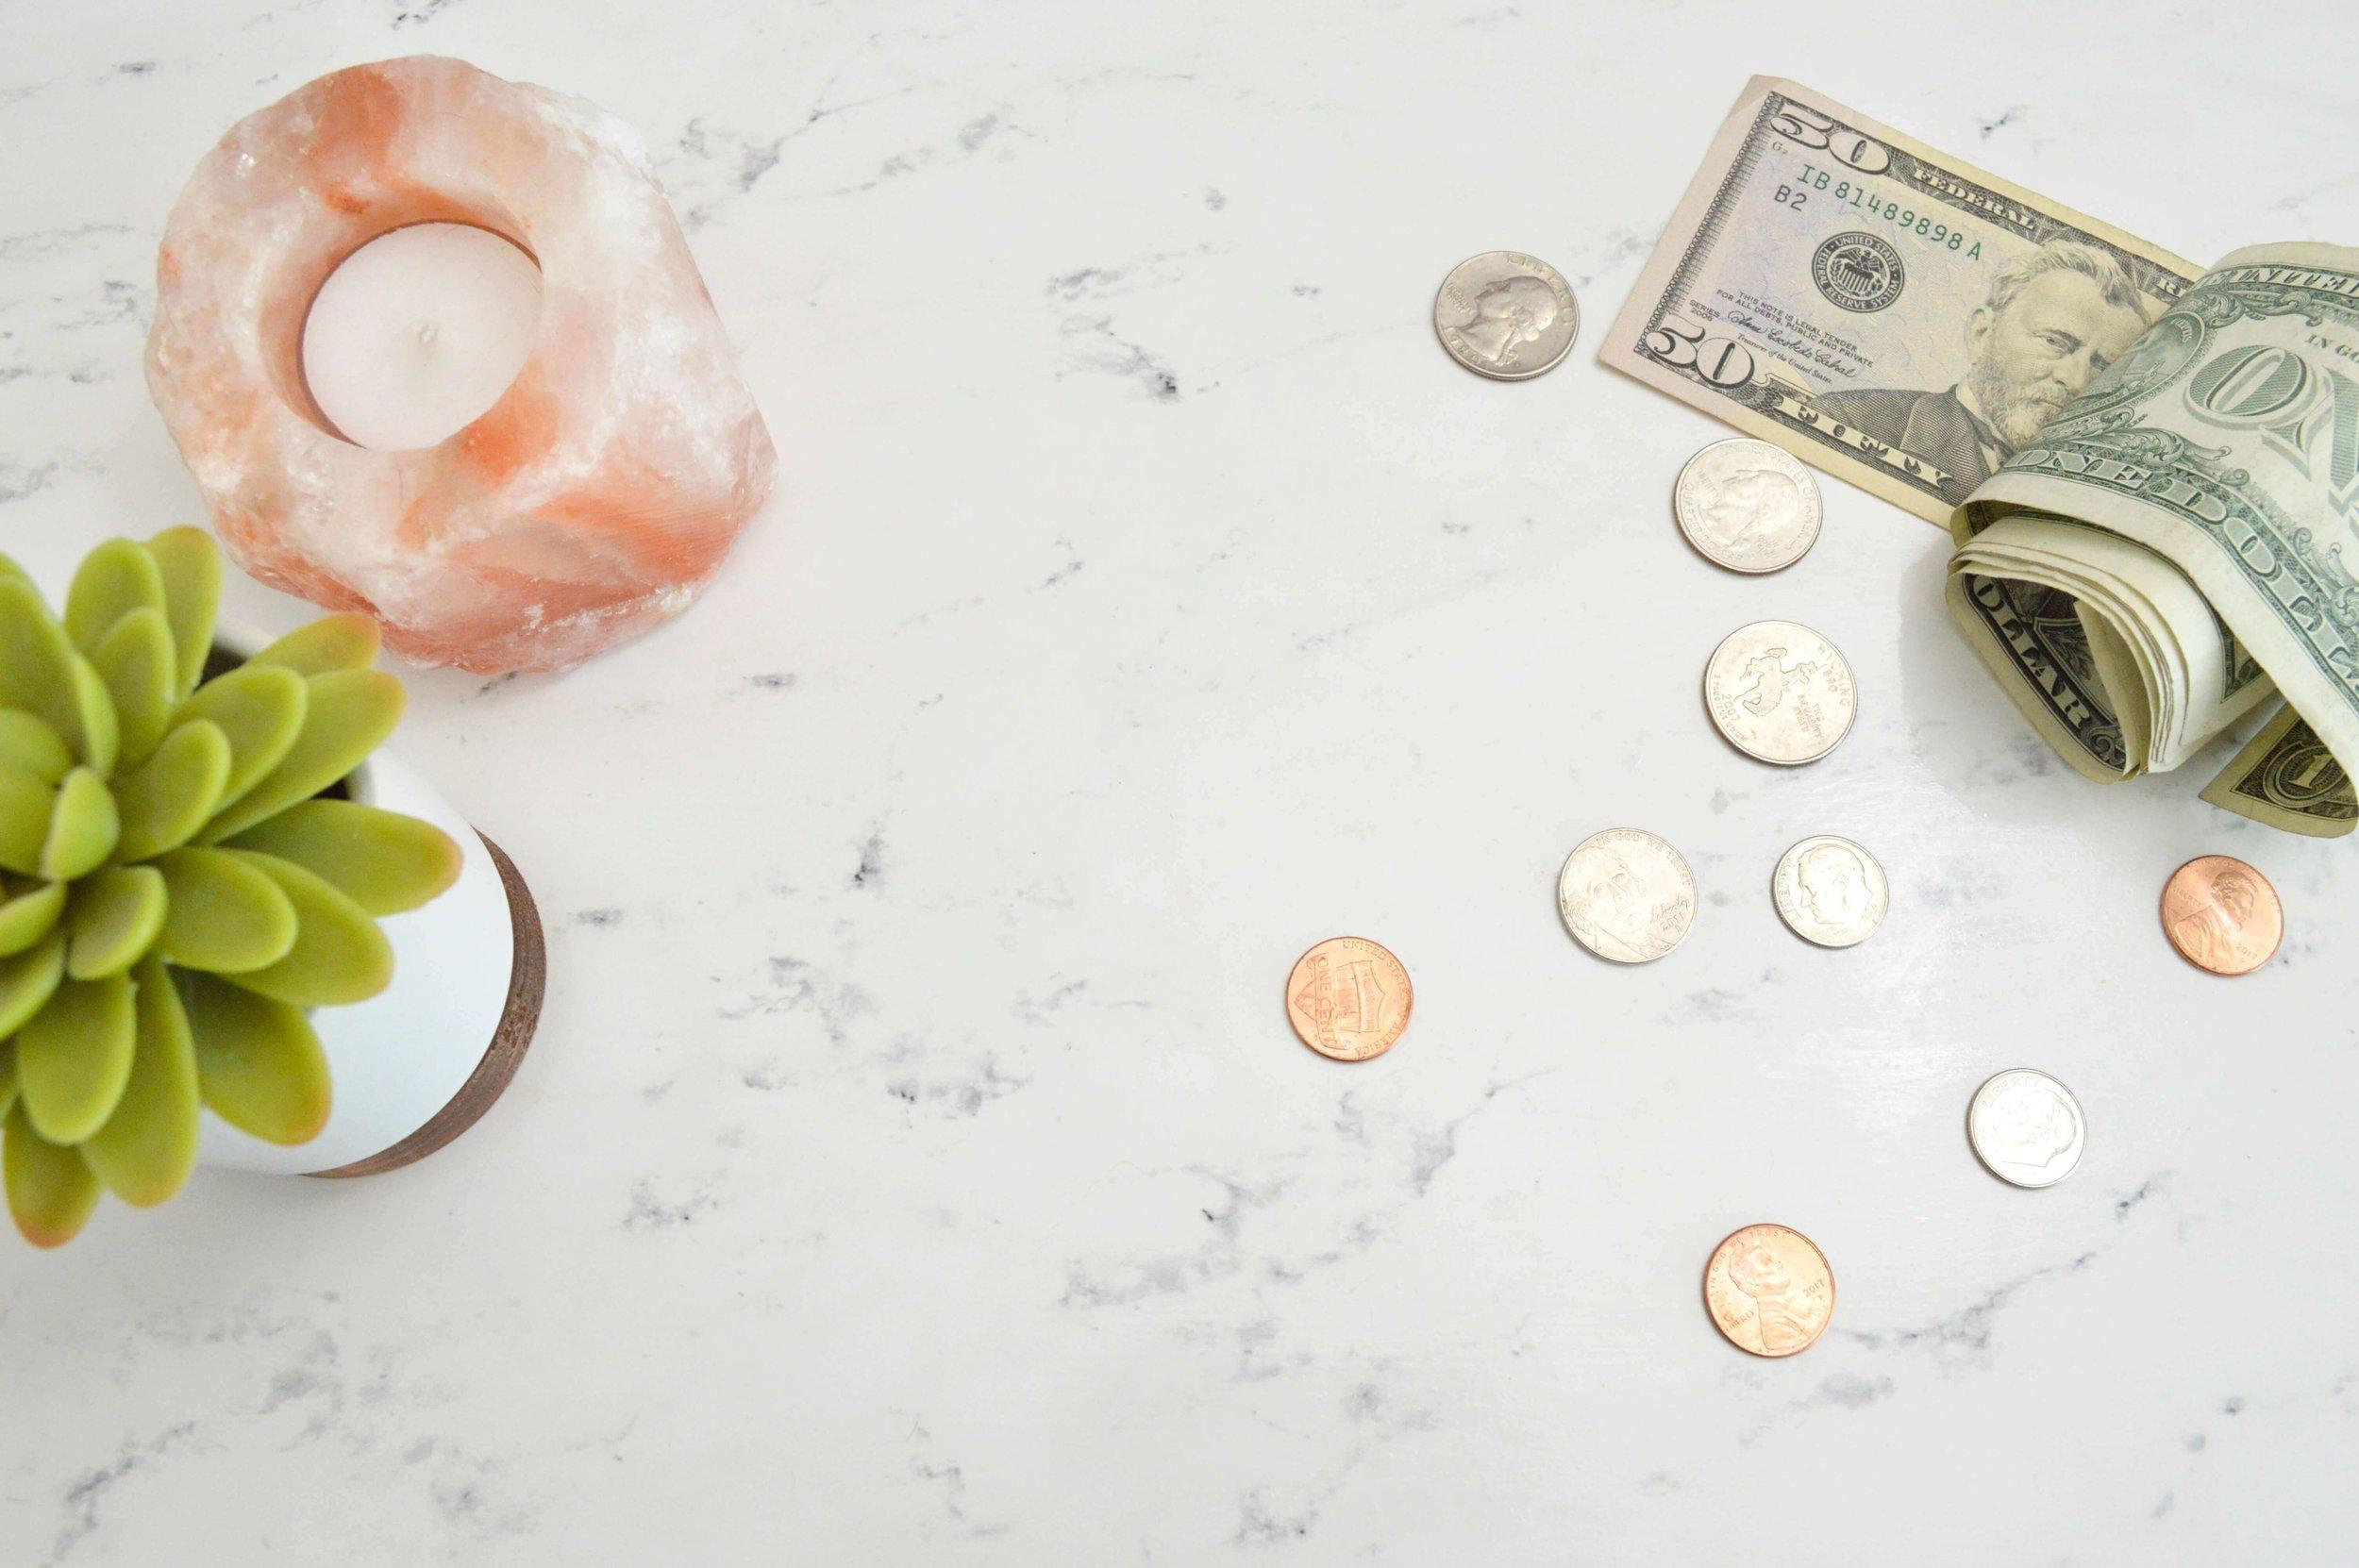 hatch-tribe-charlesotn-tax-money-business-entrepreneurs-taxes-finances-tips-advice-easy2-2.jpg